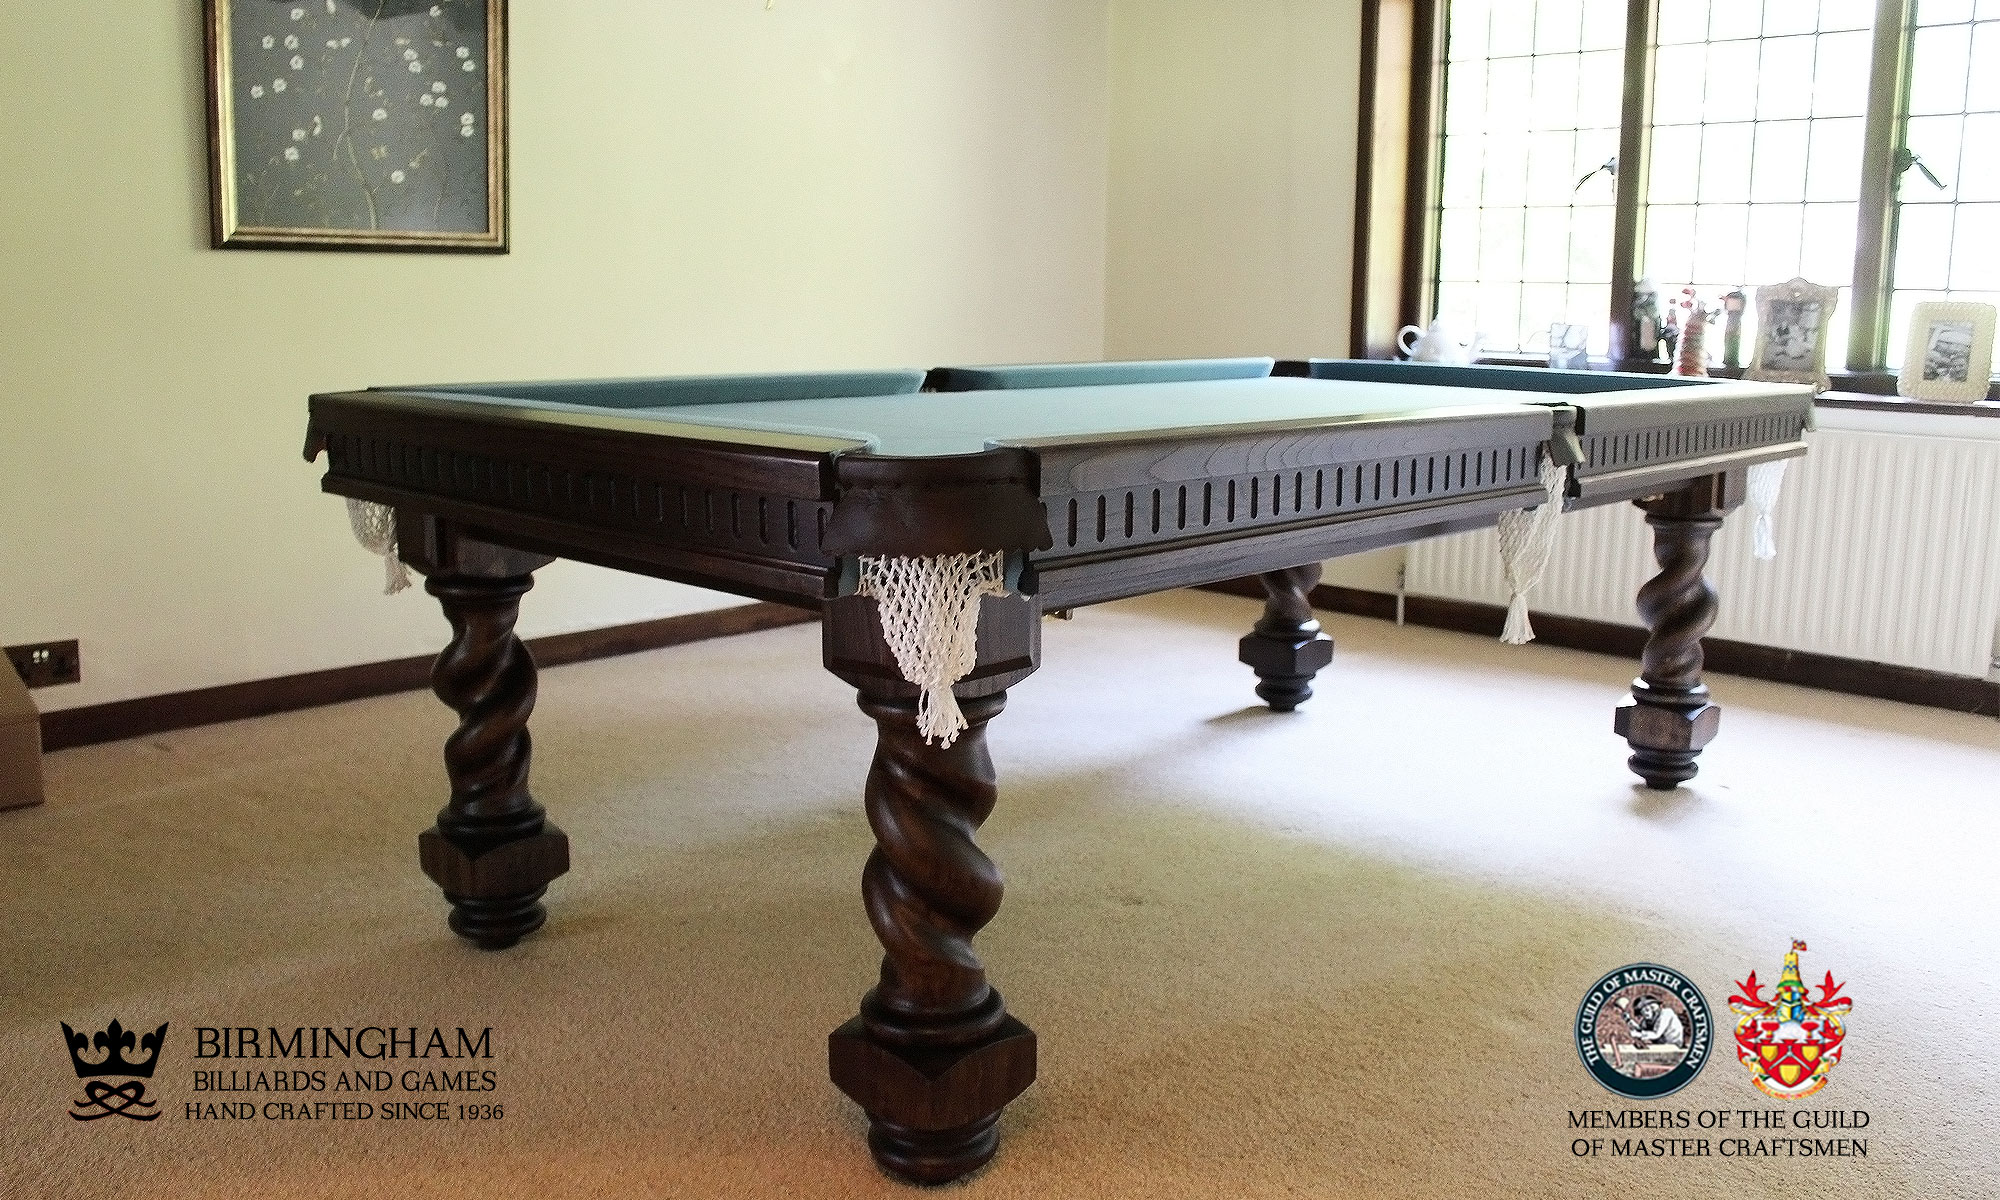 The Barley twist handmade pool table, dark oak finish with powder blue baize